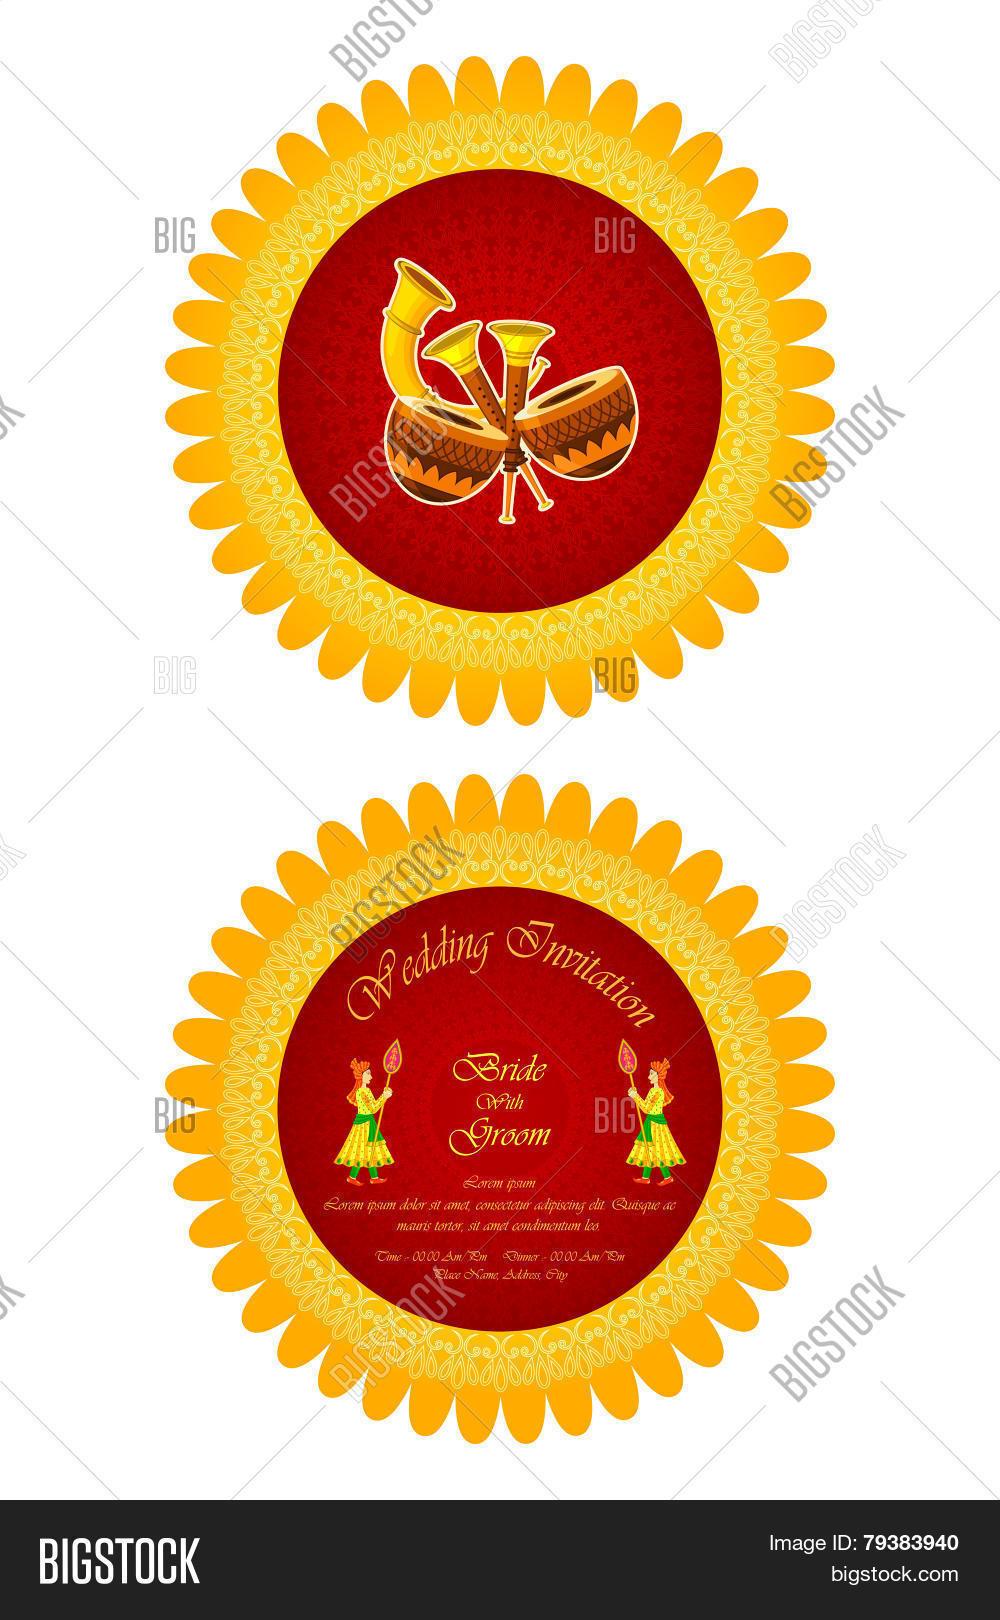 Indian Wedding Vector & Photo (Free Trial) | Bigstock